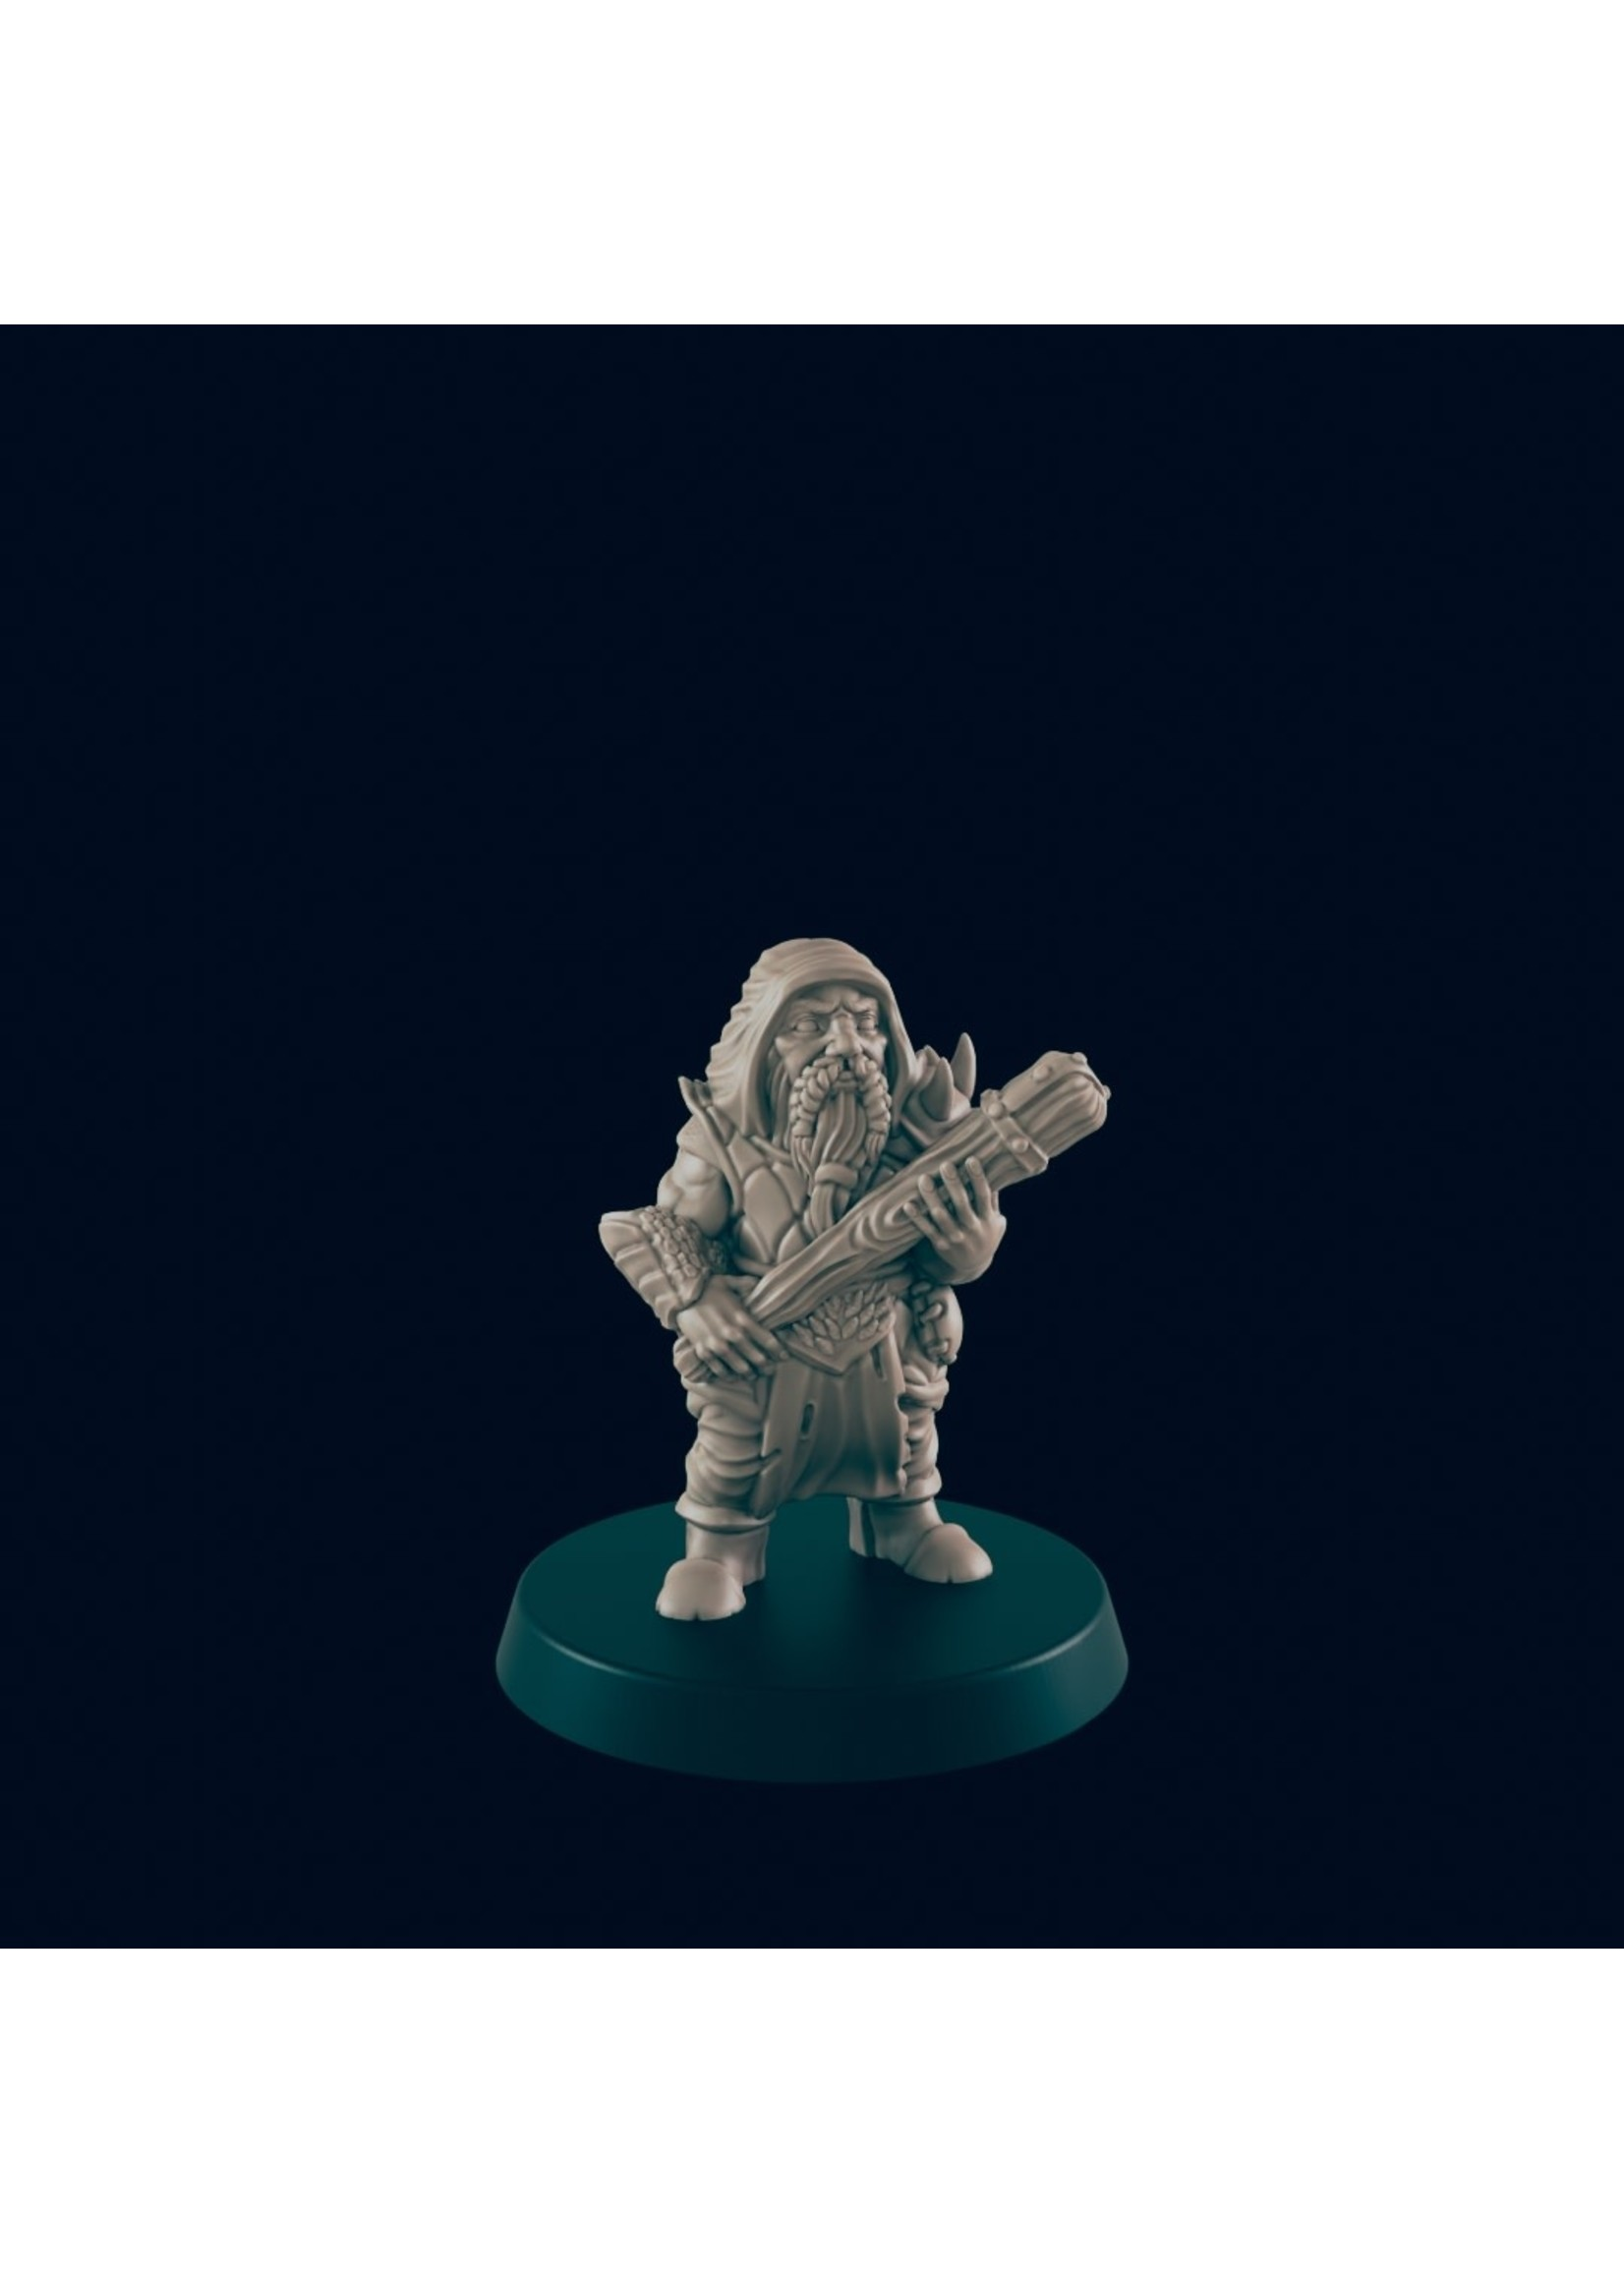 3D Printed Miniature - Dwarf Bandit - Dungeons & Dragons - Beasts and Baddies KS